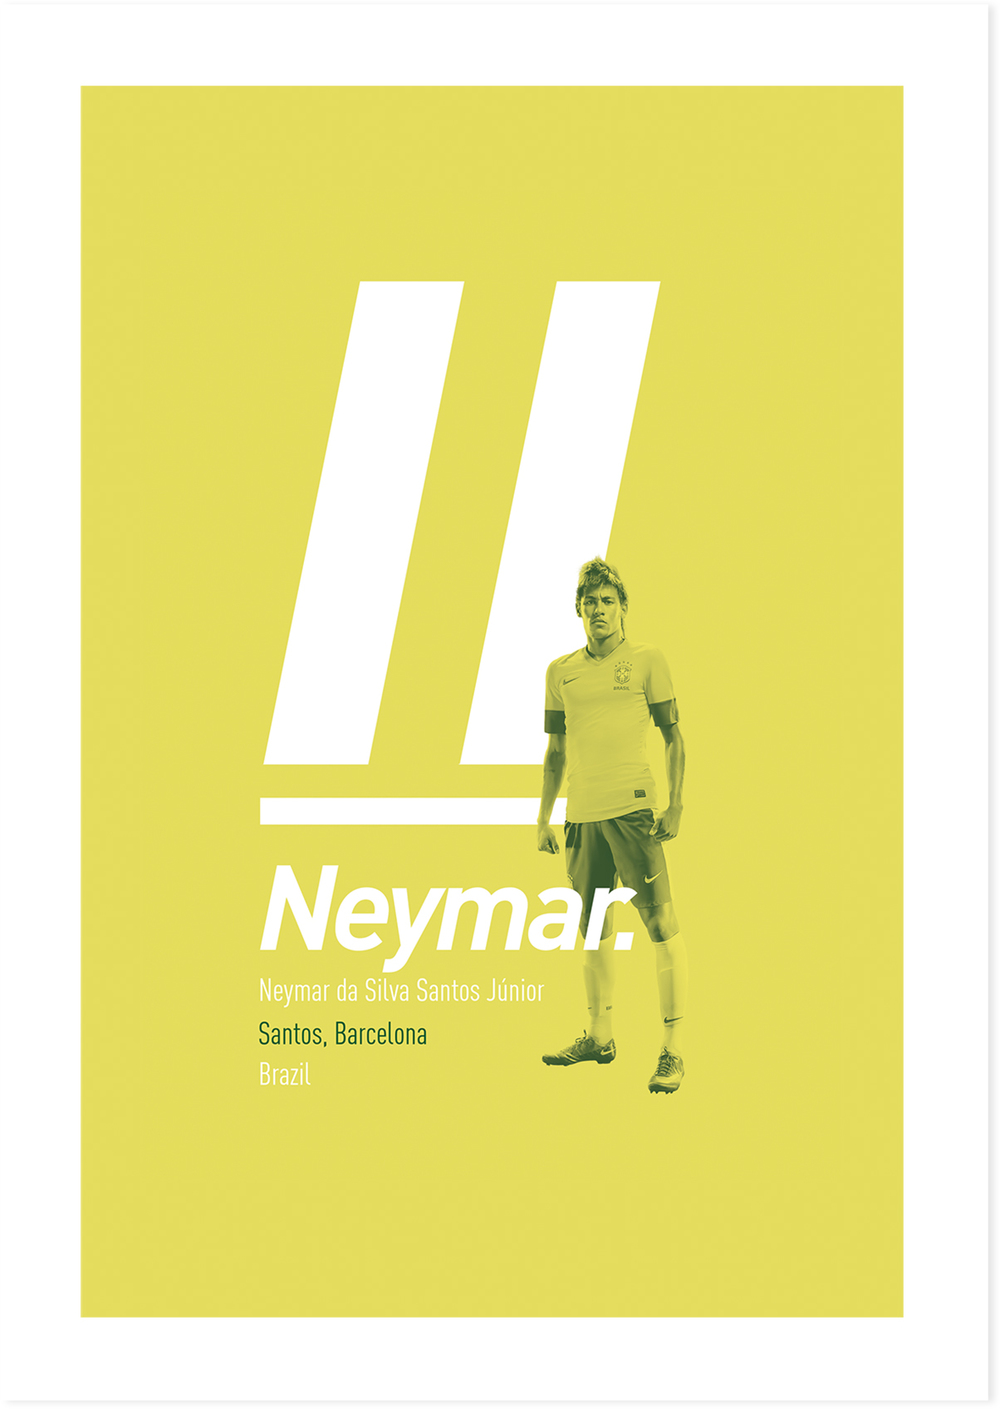 Neymar_web.jpg